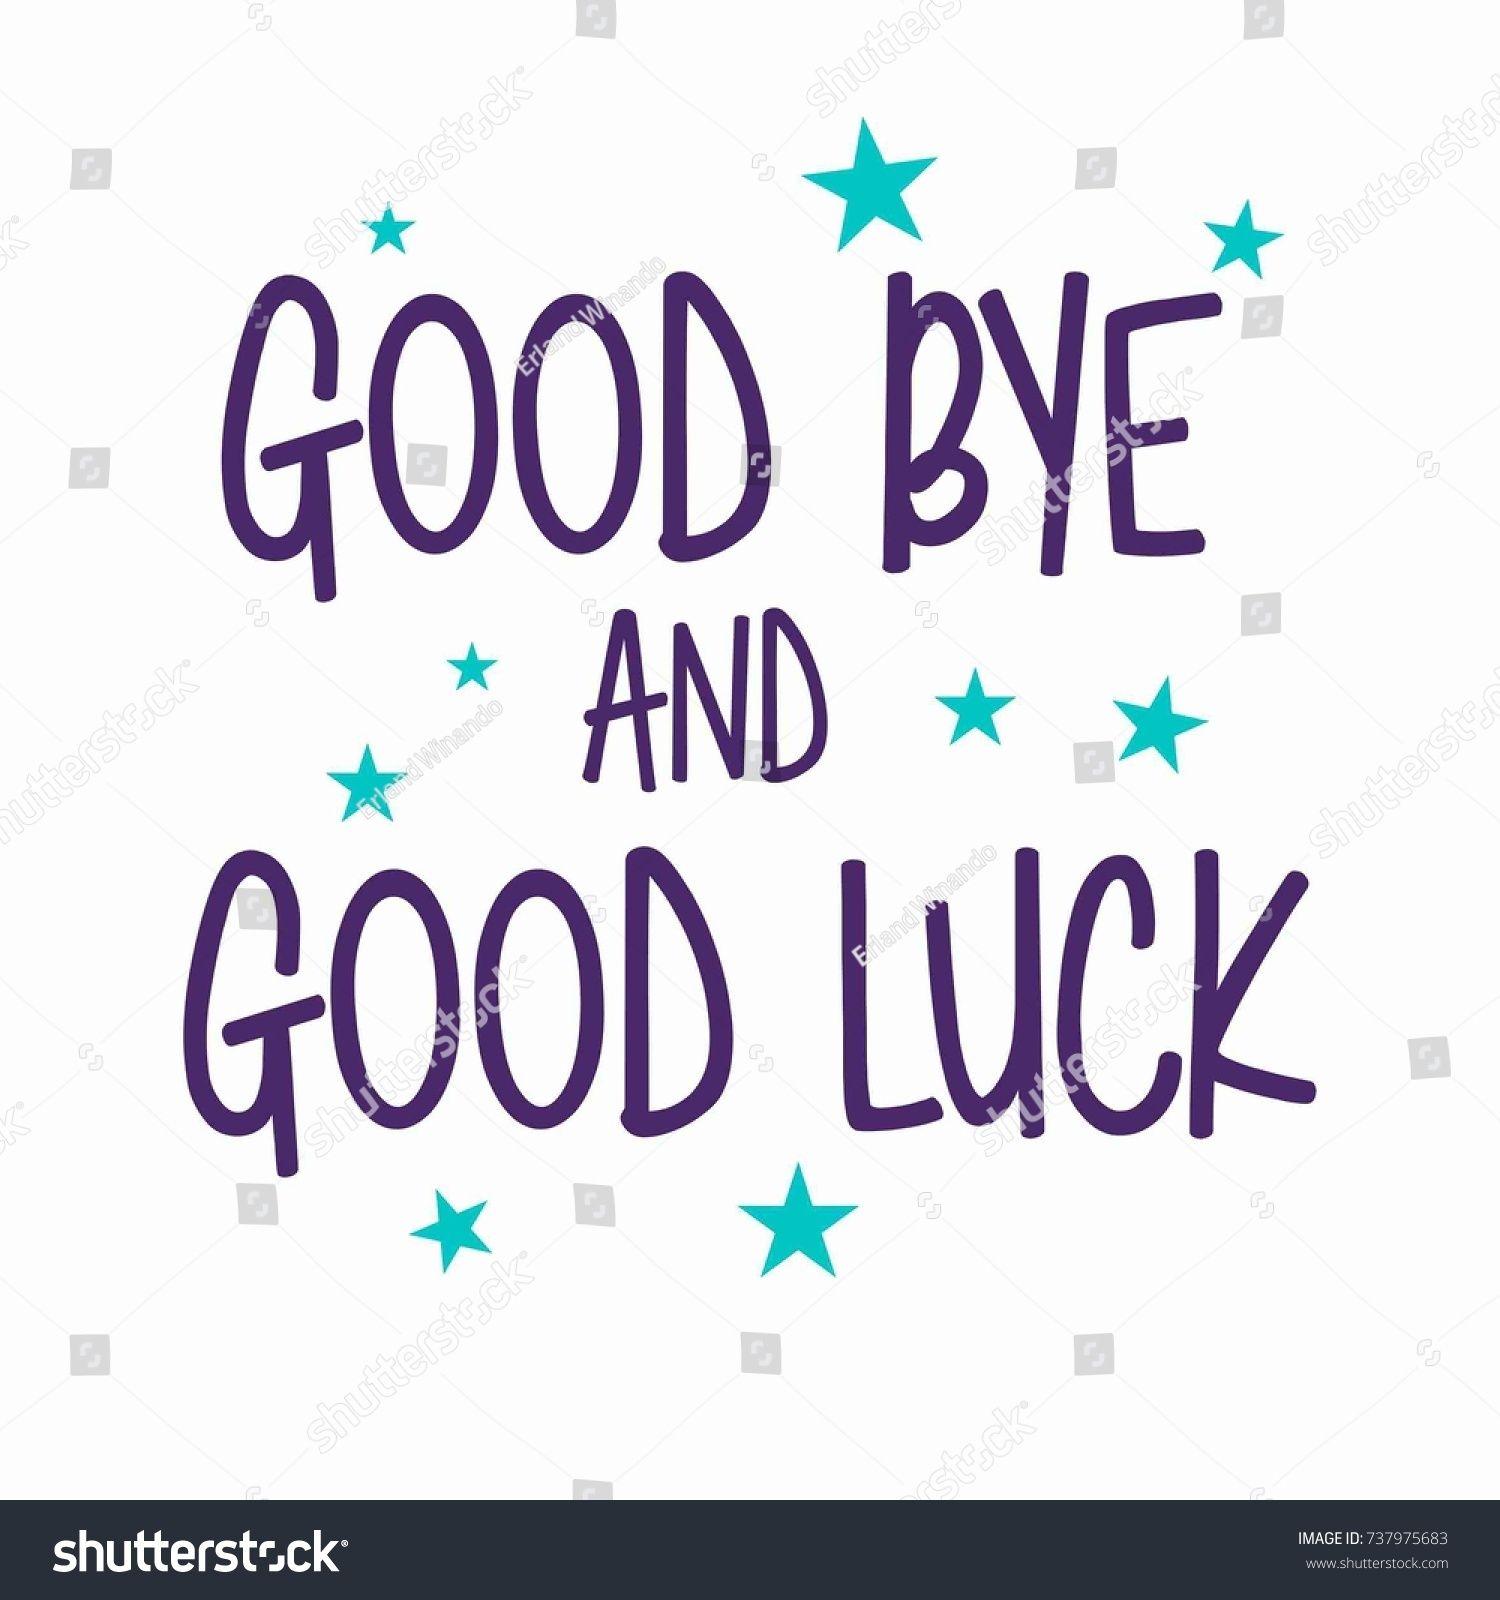 Farewell Card Template Calep Midnightpig Co Regarding Goodbye Card Template Business Professional Farewell Cards Best Templates Business Card Template Word